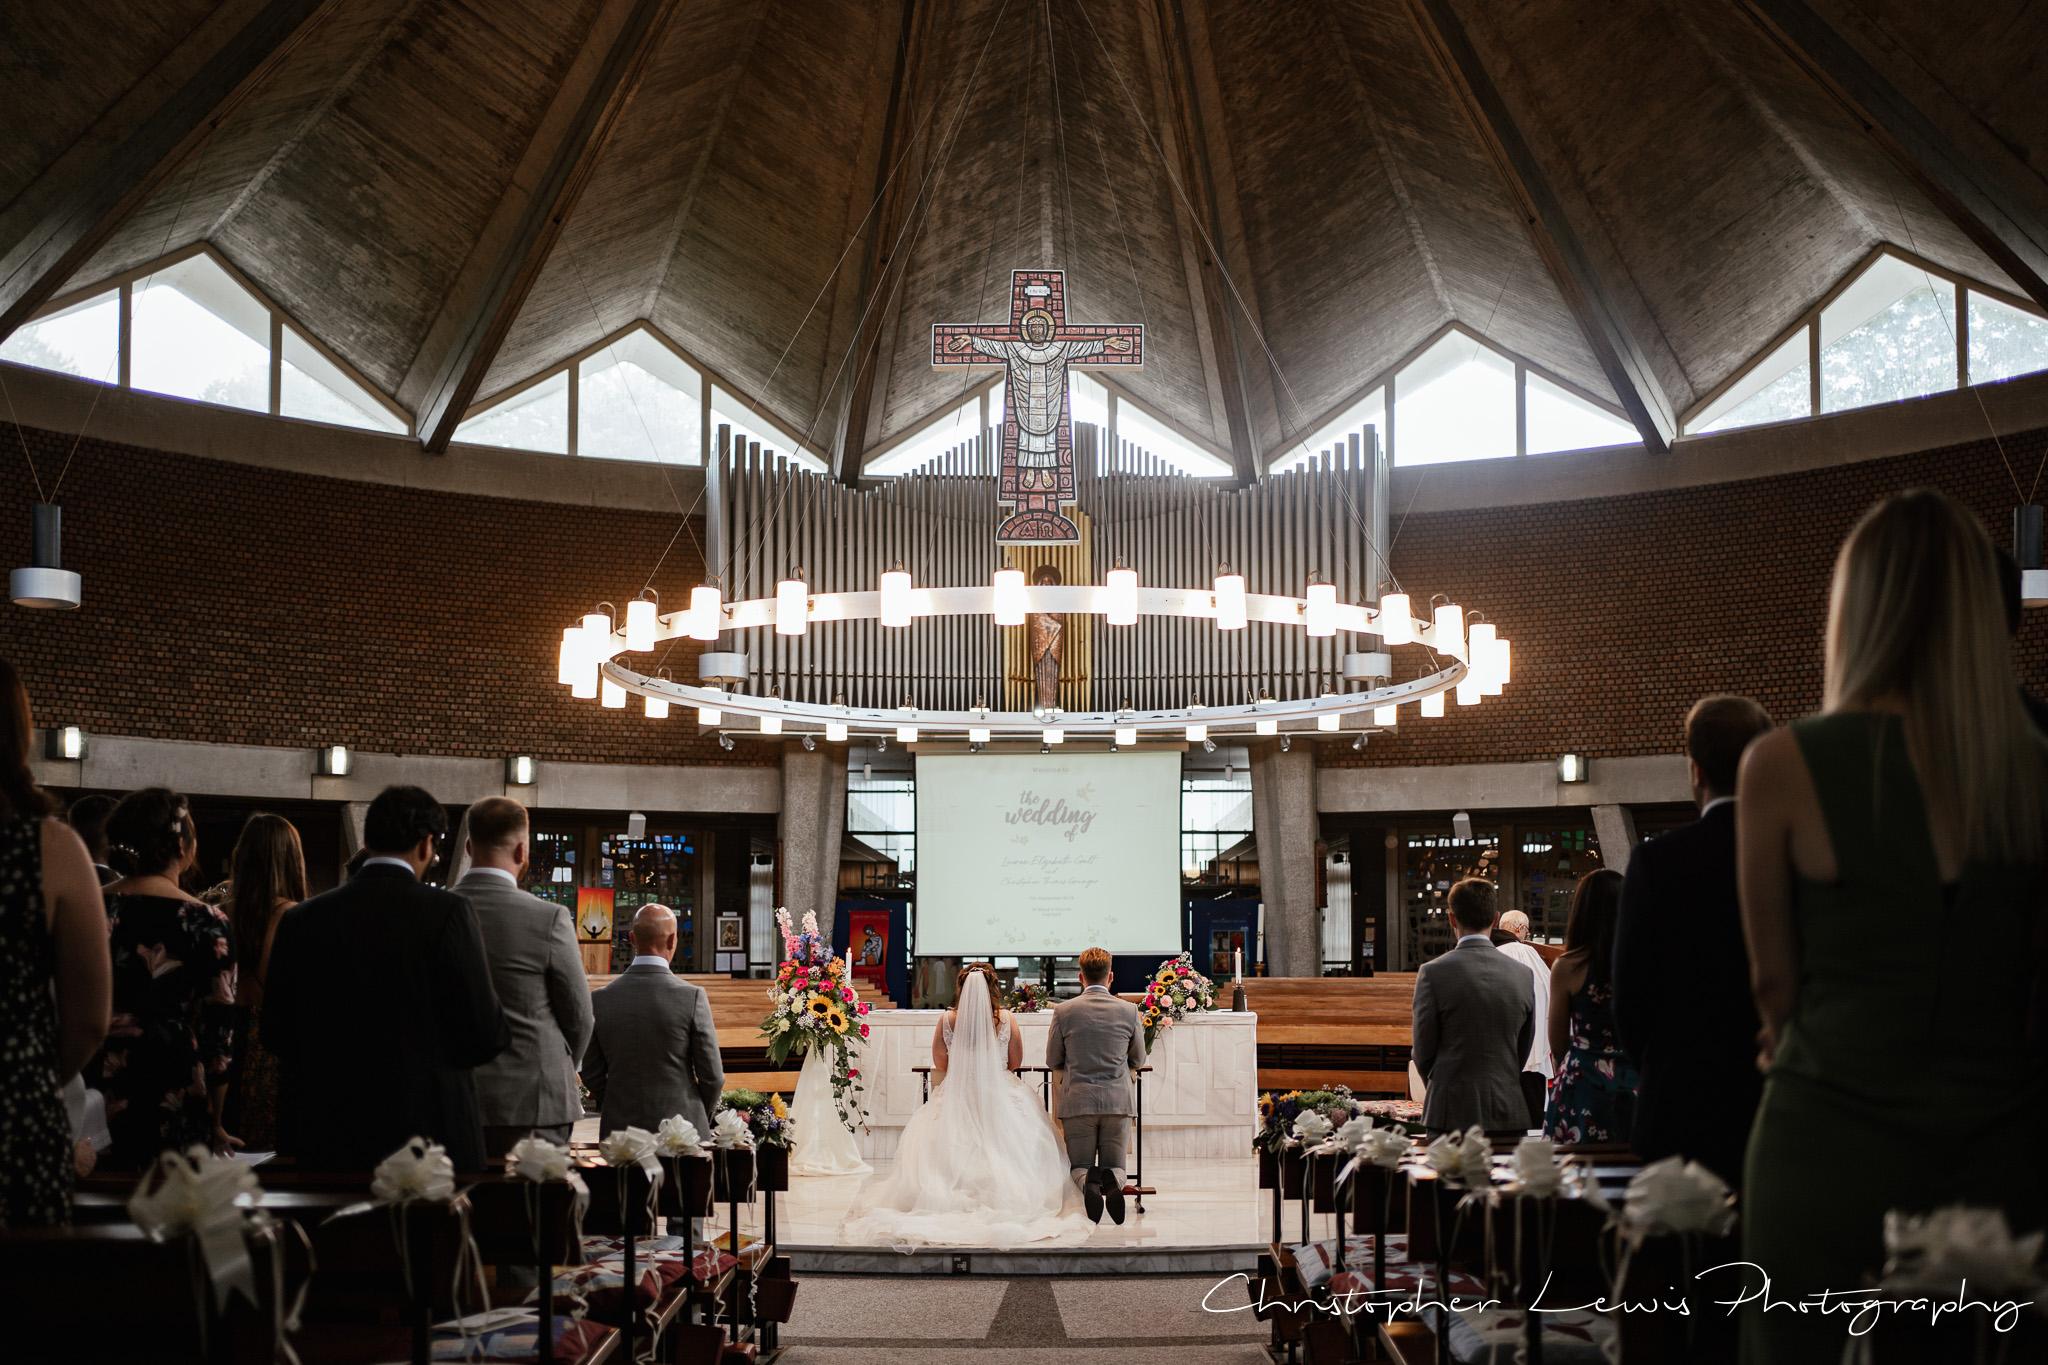 Samlesbury Hall Wedding church